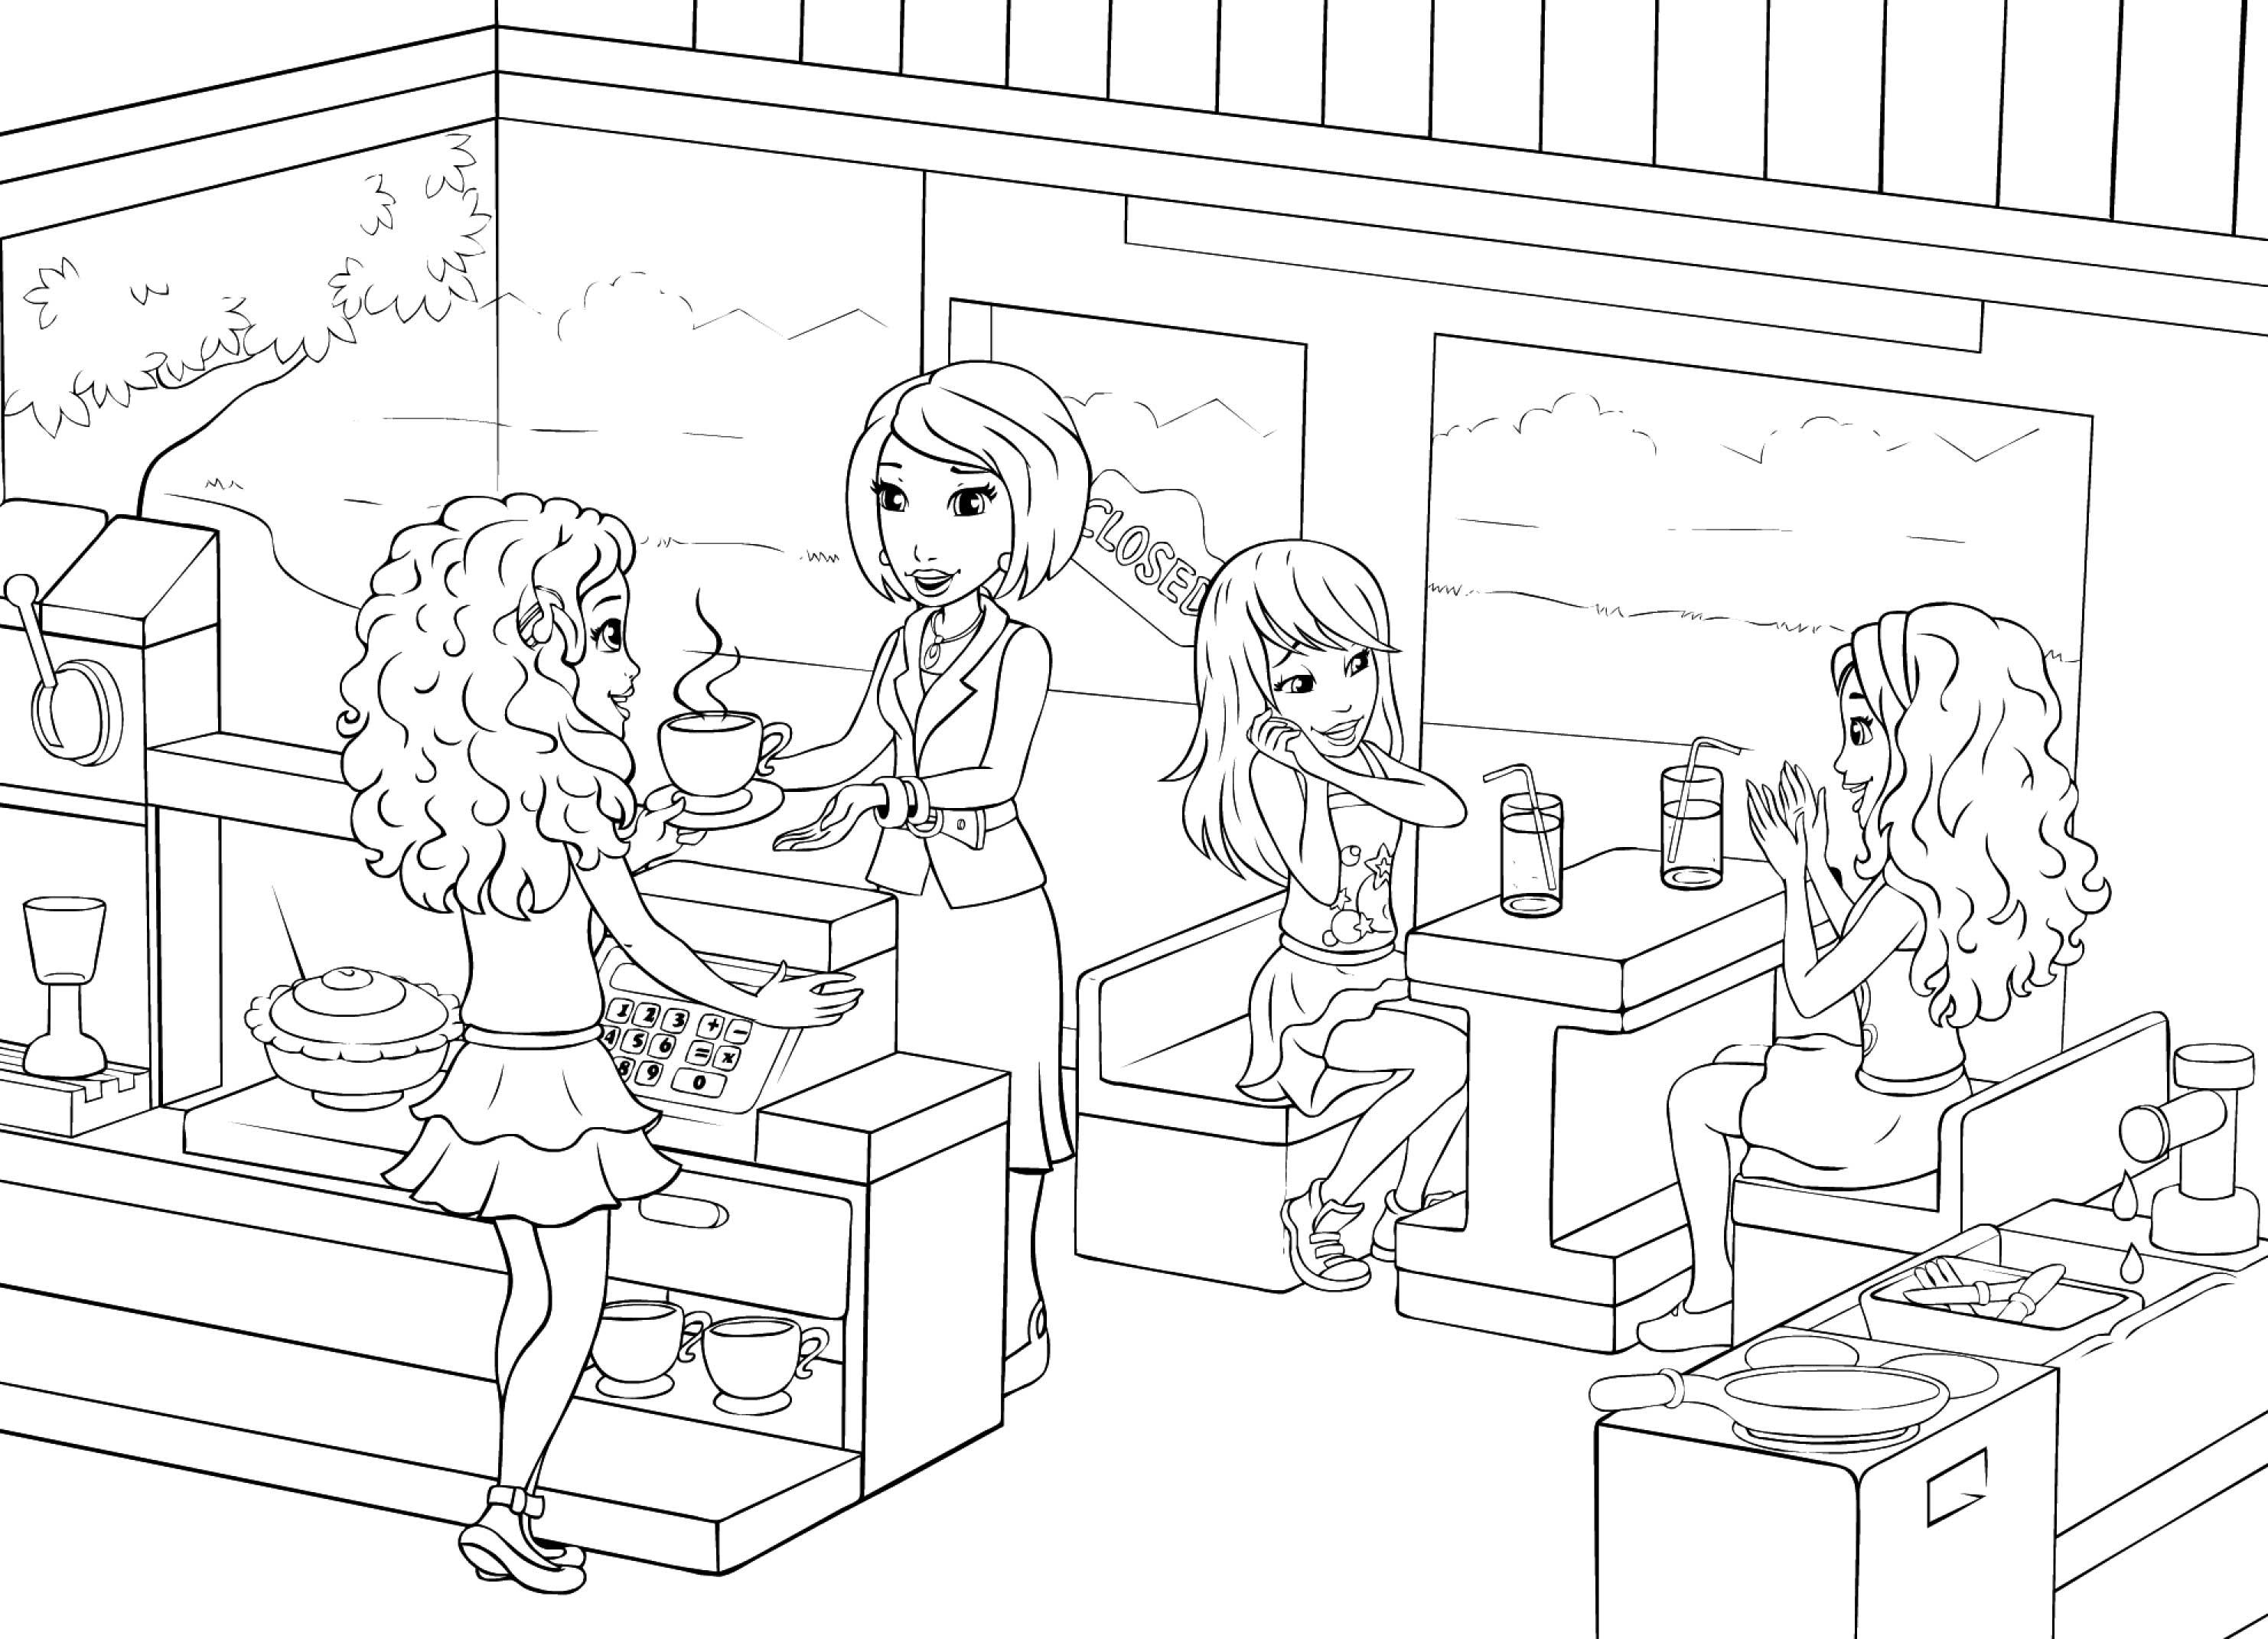 lego friends dibujos colorear cafeteria - Dibujalandia